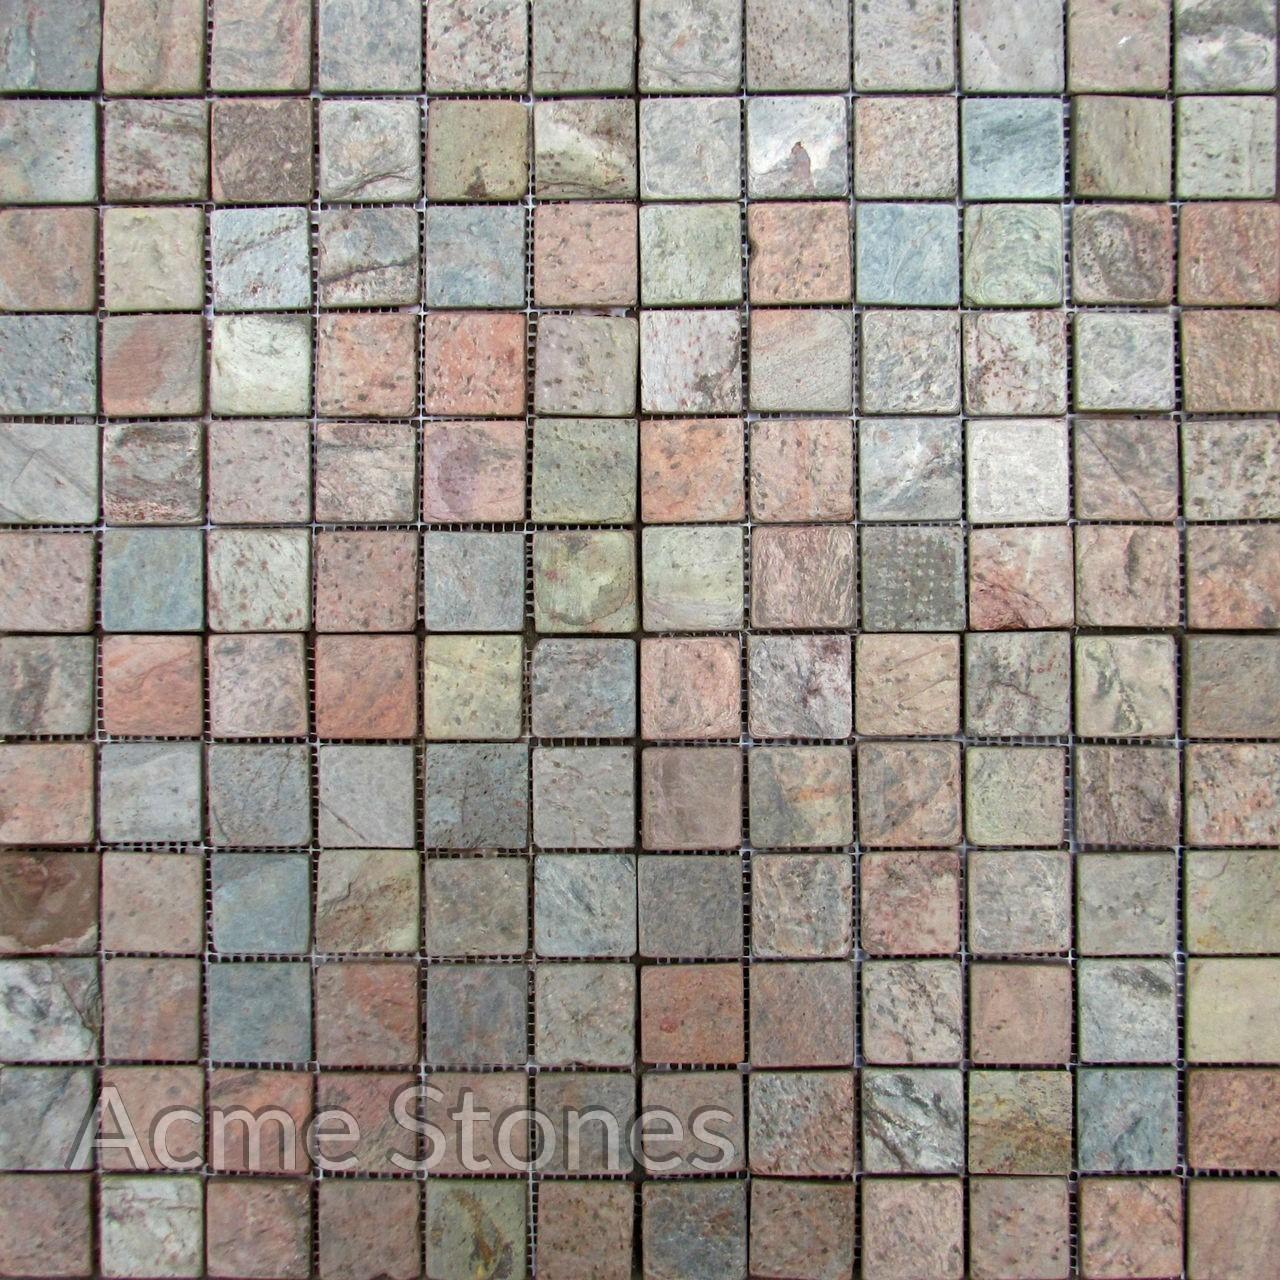 Regular Mosaic Copper 23x23mm Tumbled